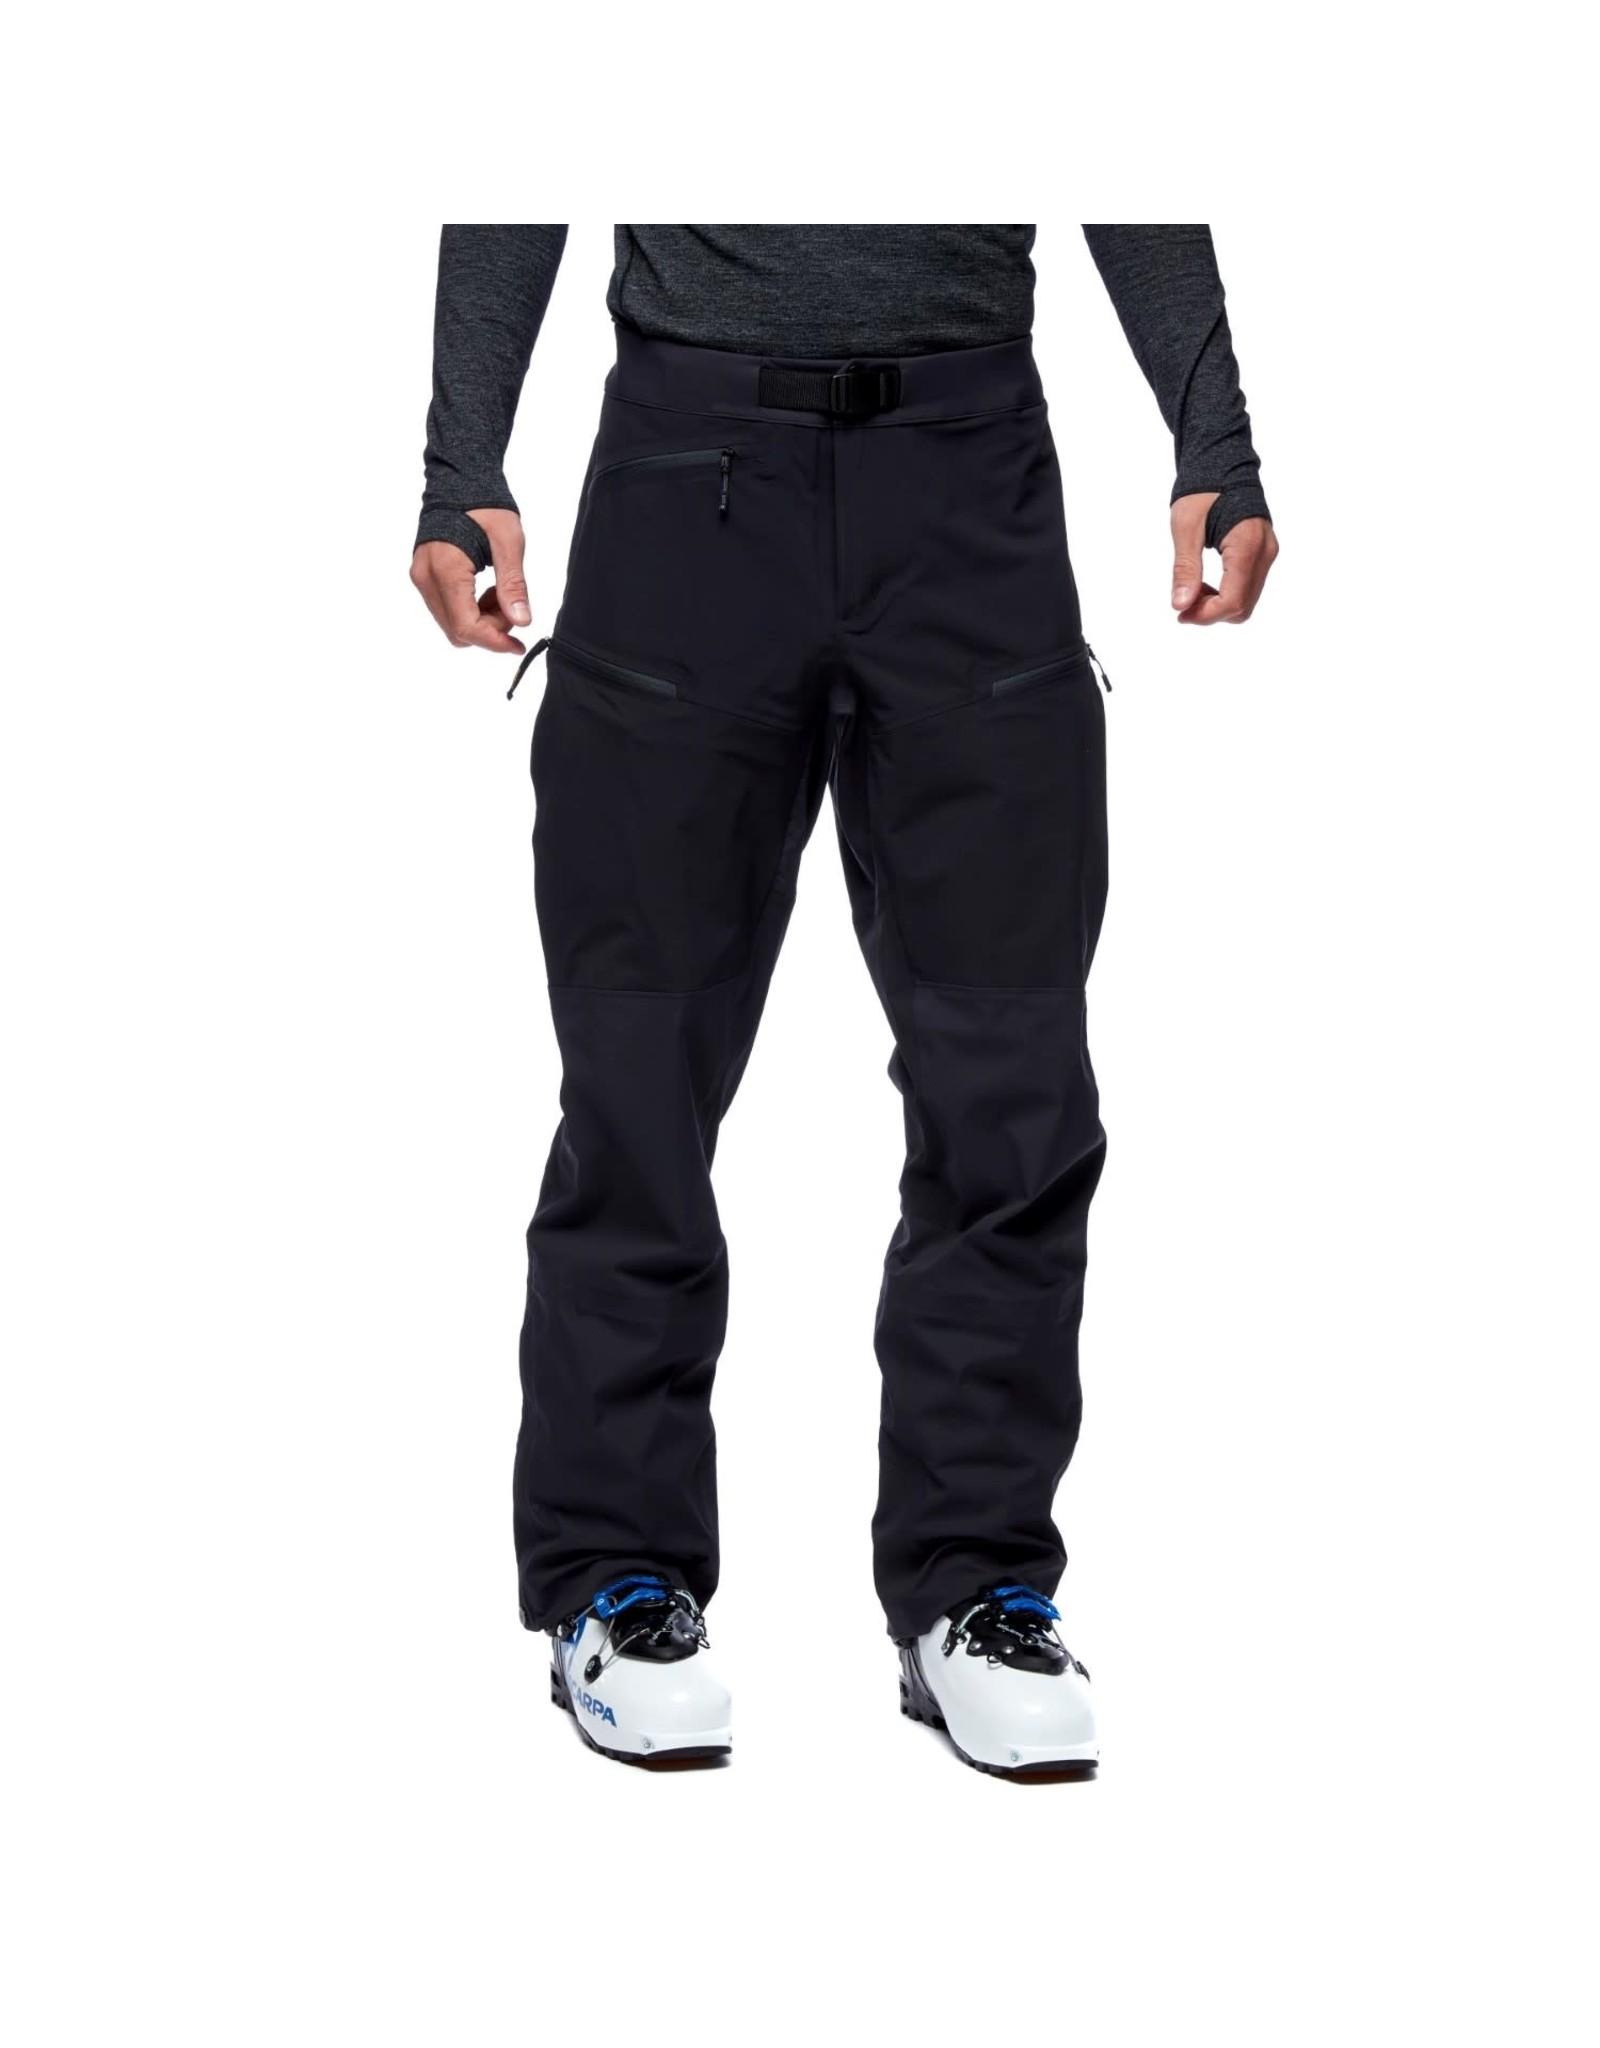 Black Diamond Black Diamond Dawn Patrol Hybrid Pants - Men